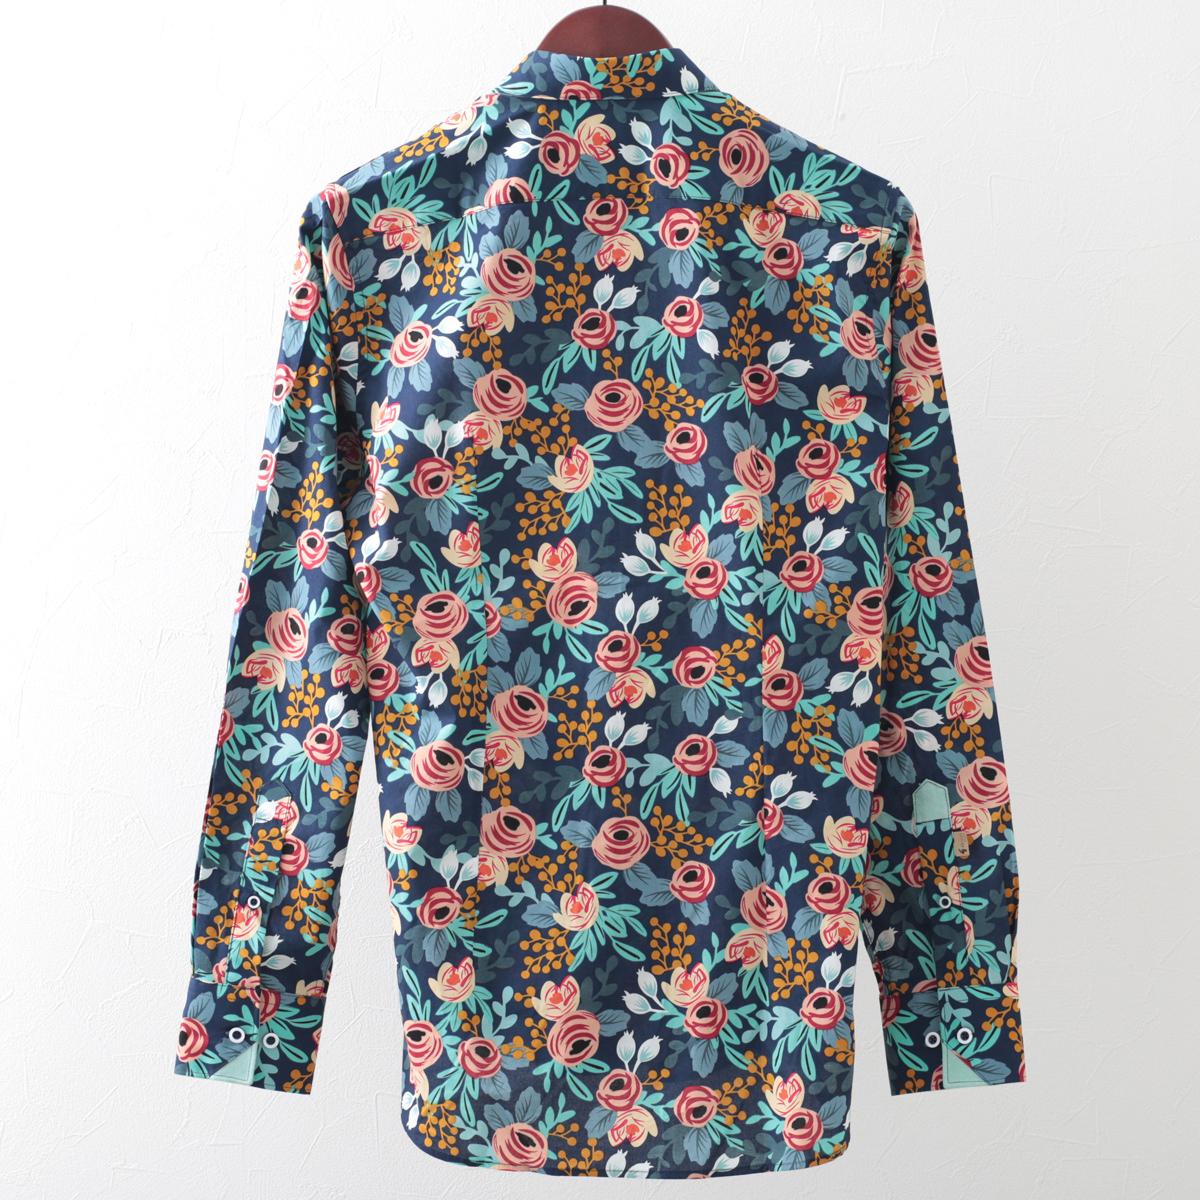 Gabicci メンズ 長袖シャツ フローラル ガビッチ ネイビー レトロ 花柄シャツ モッズファッション